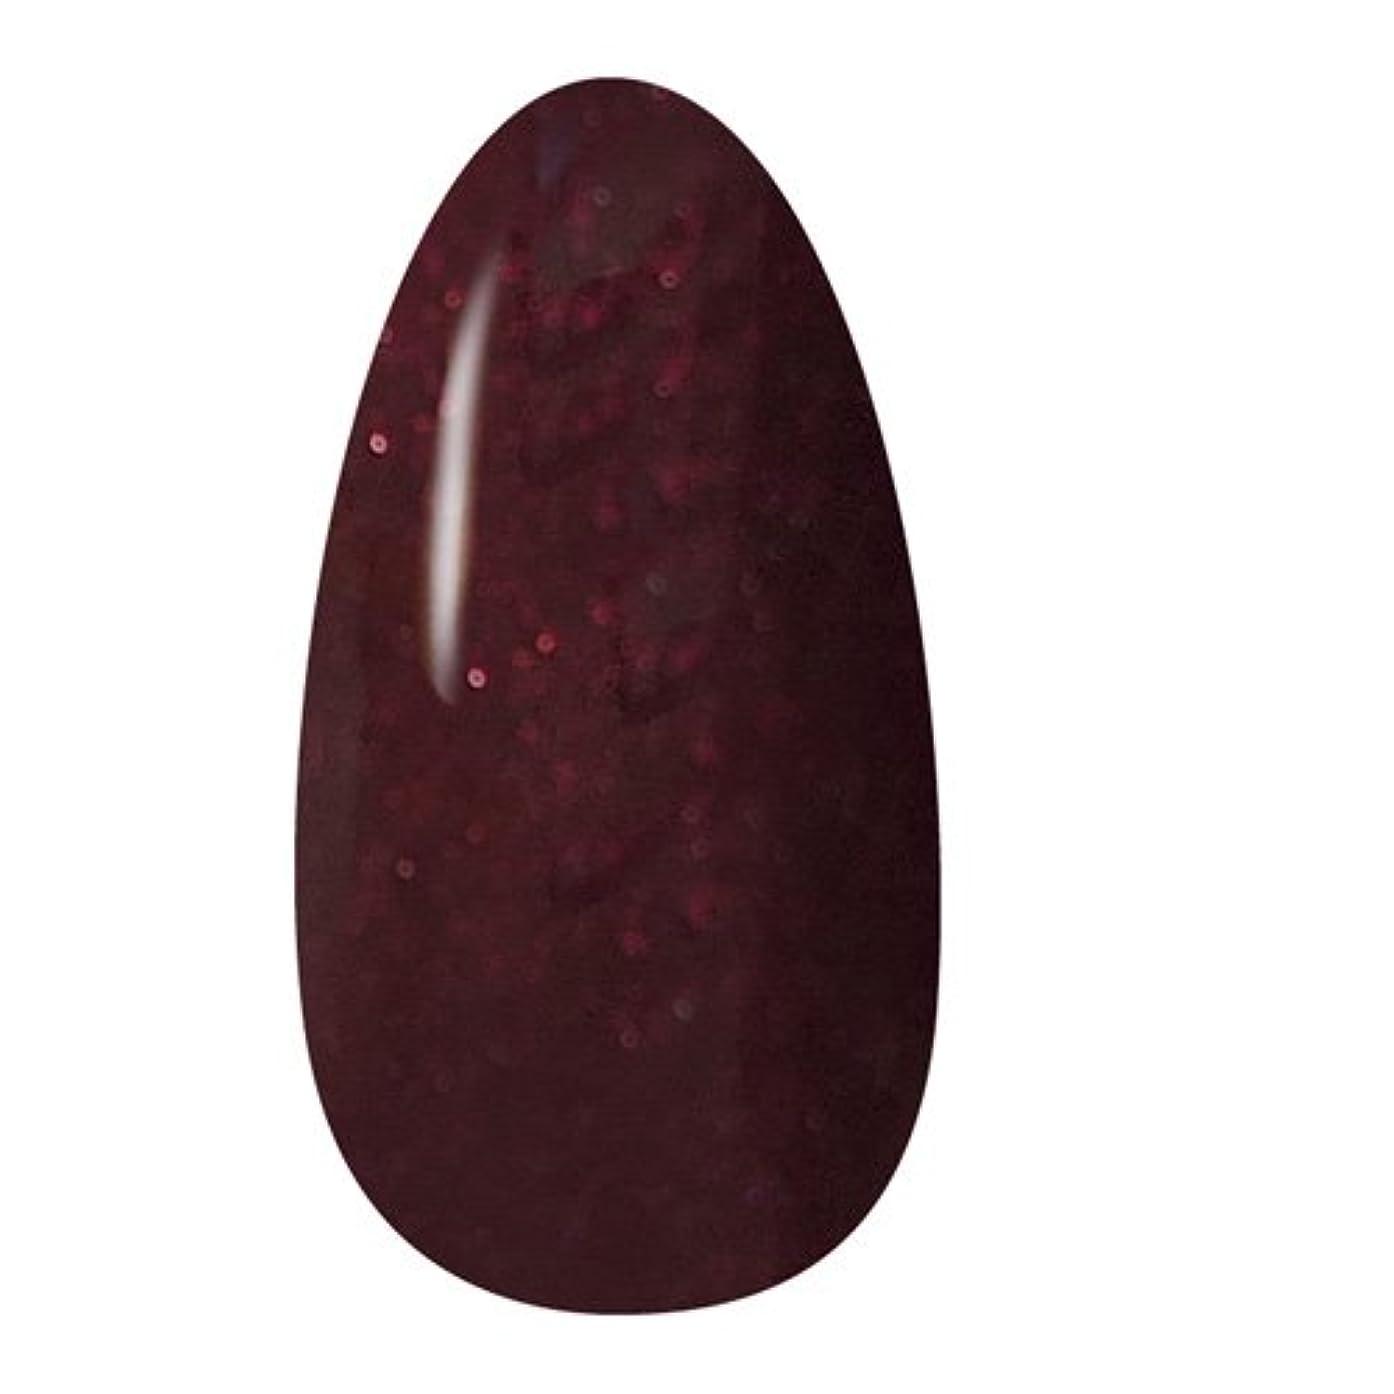 CherryDayネイルポリッシュ #260 ギャラクシーレッド 8mL